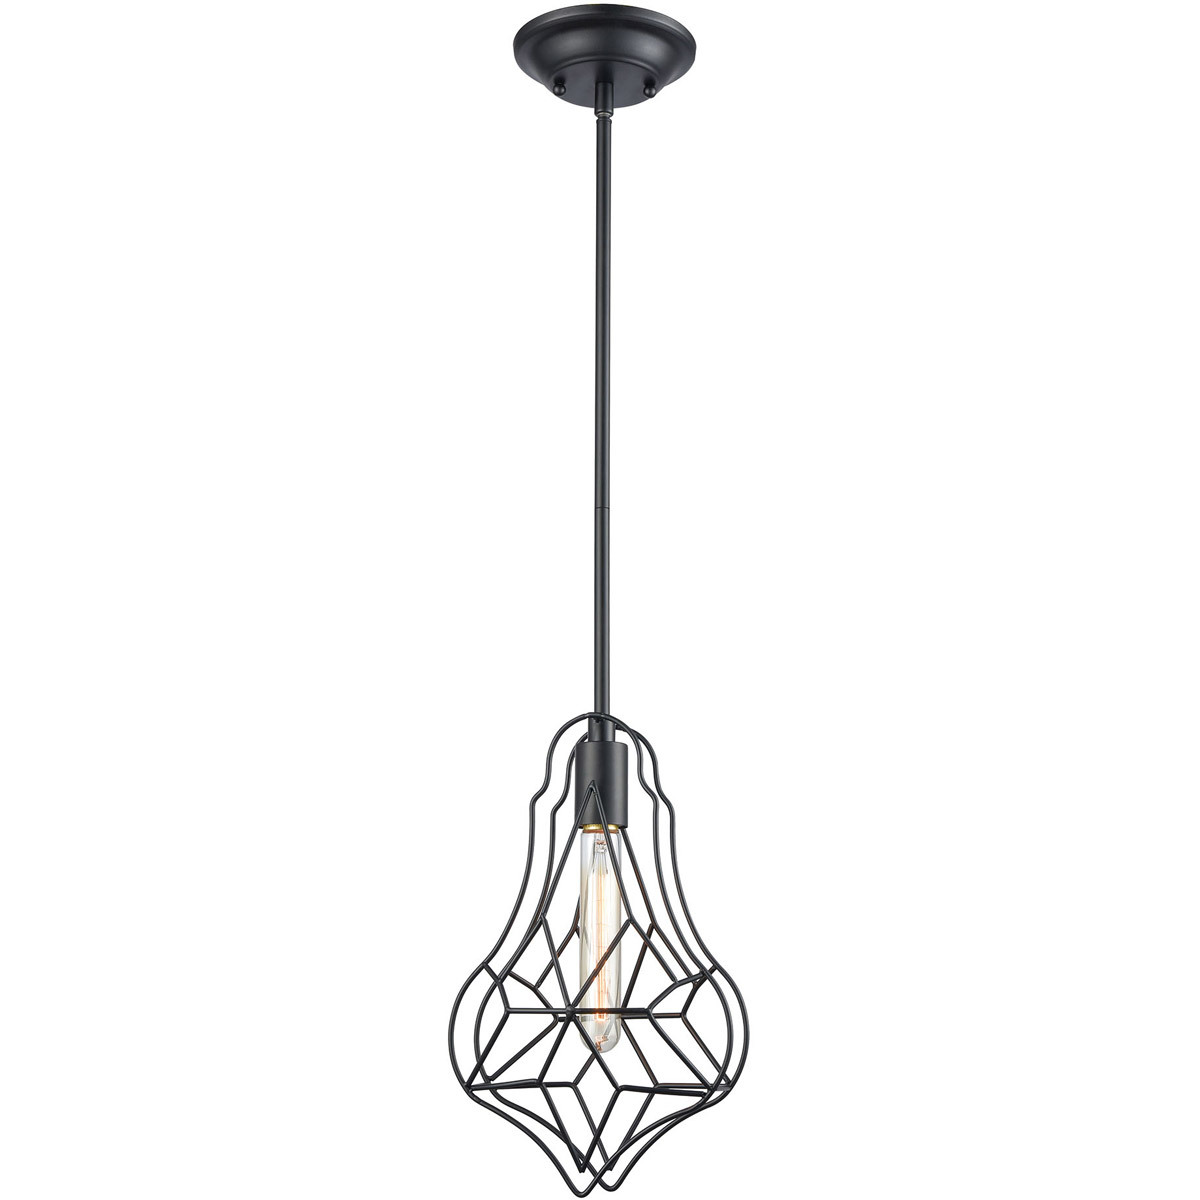 Pendants 1 Light Fixture With Matte Black Metal Crystal